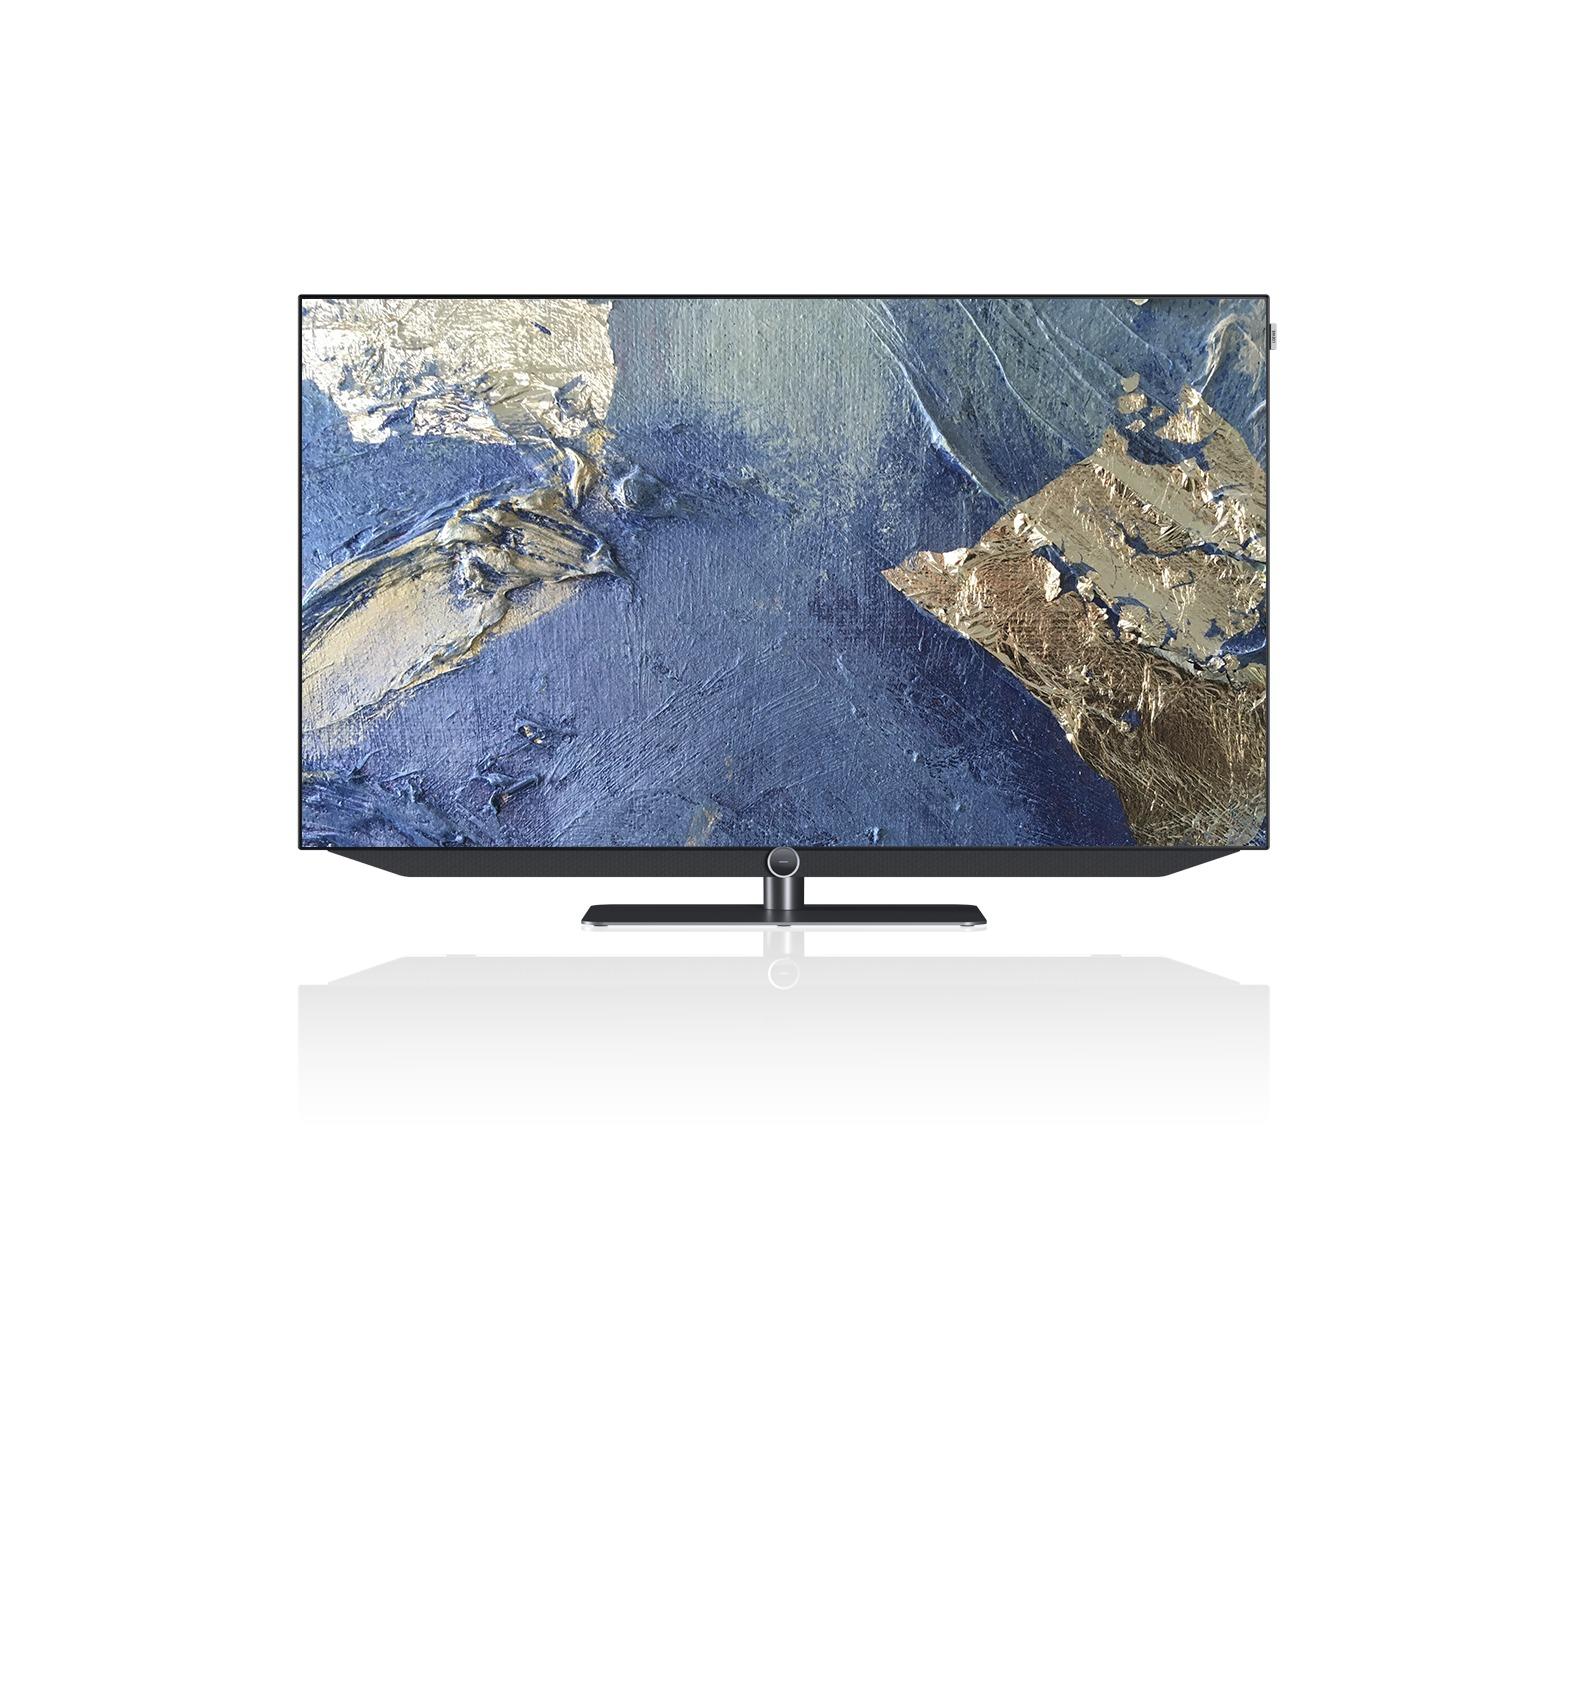 Foto van Loewe Bild V.65 OLED TV